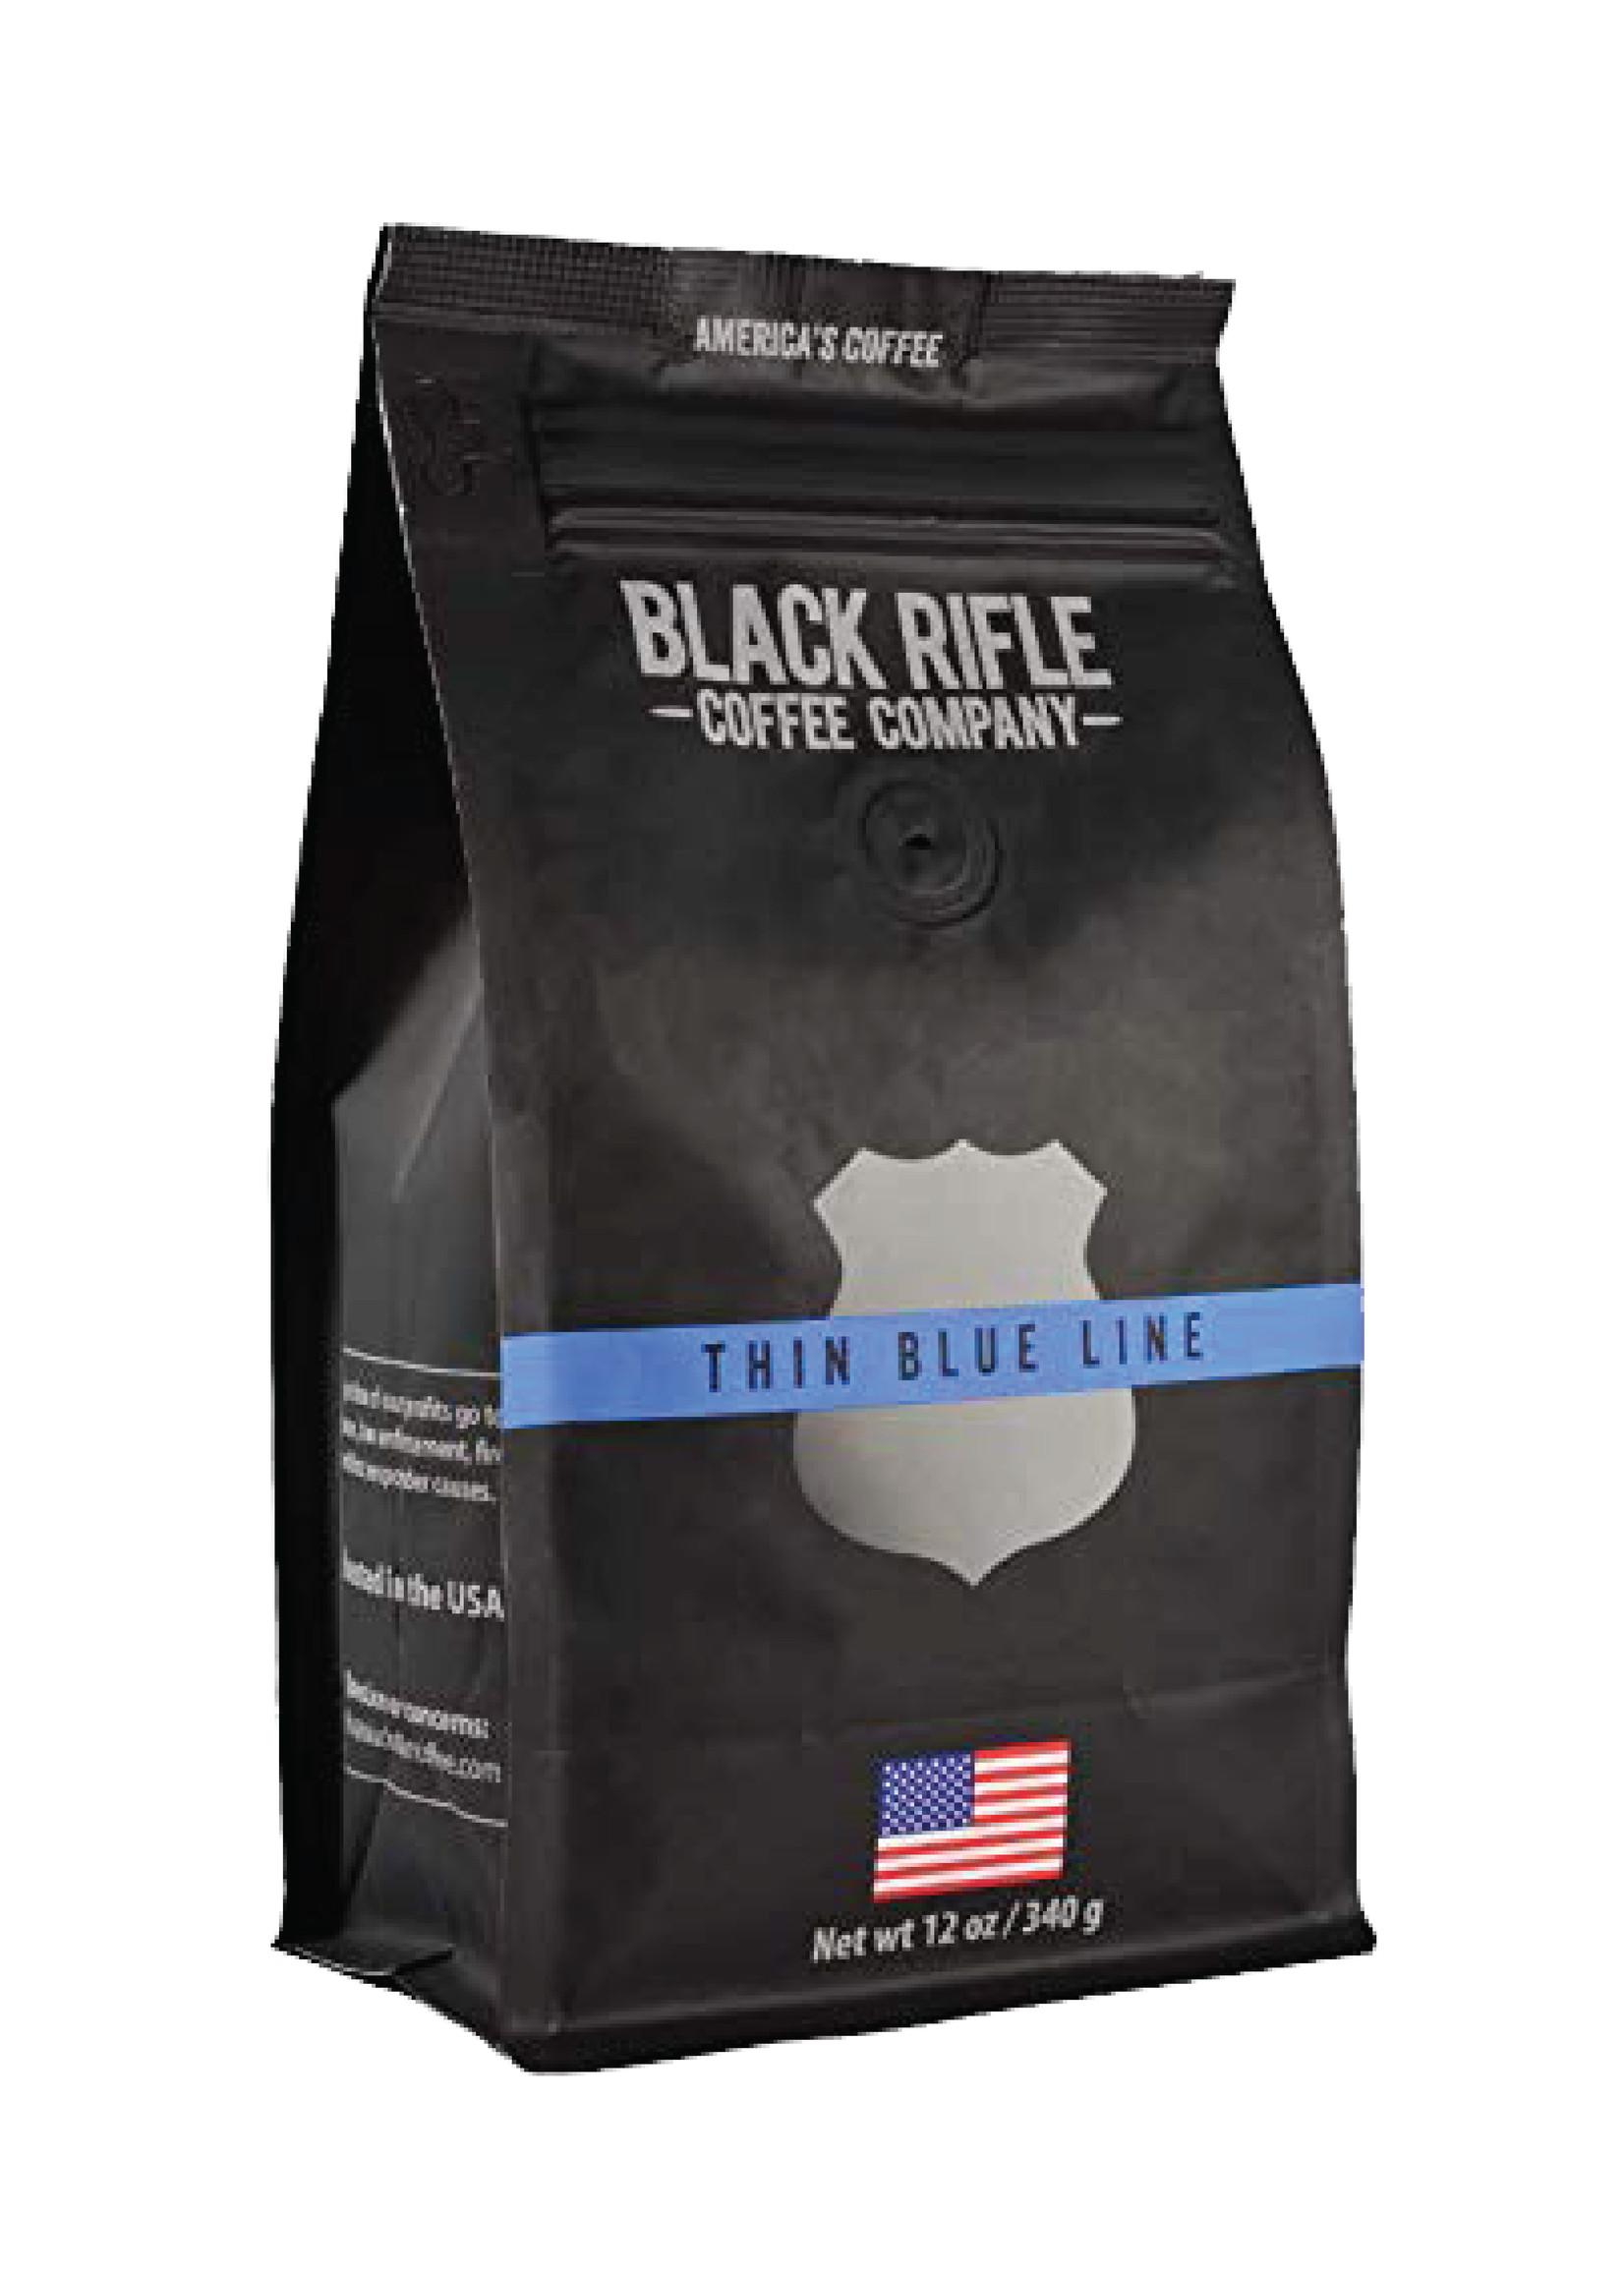 Black Rifle Coffee Company Black Rifle Coffee Company Thin Blue Line Coffee Roast Whole Bean